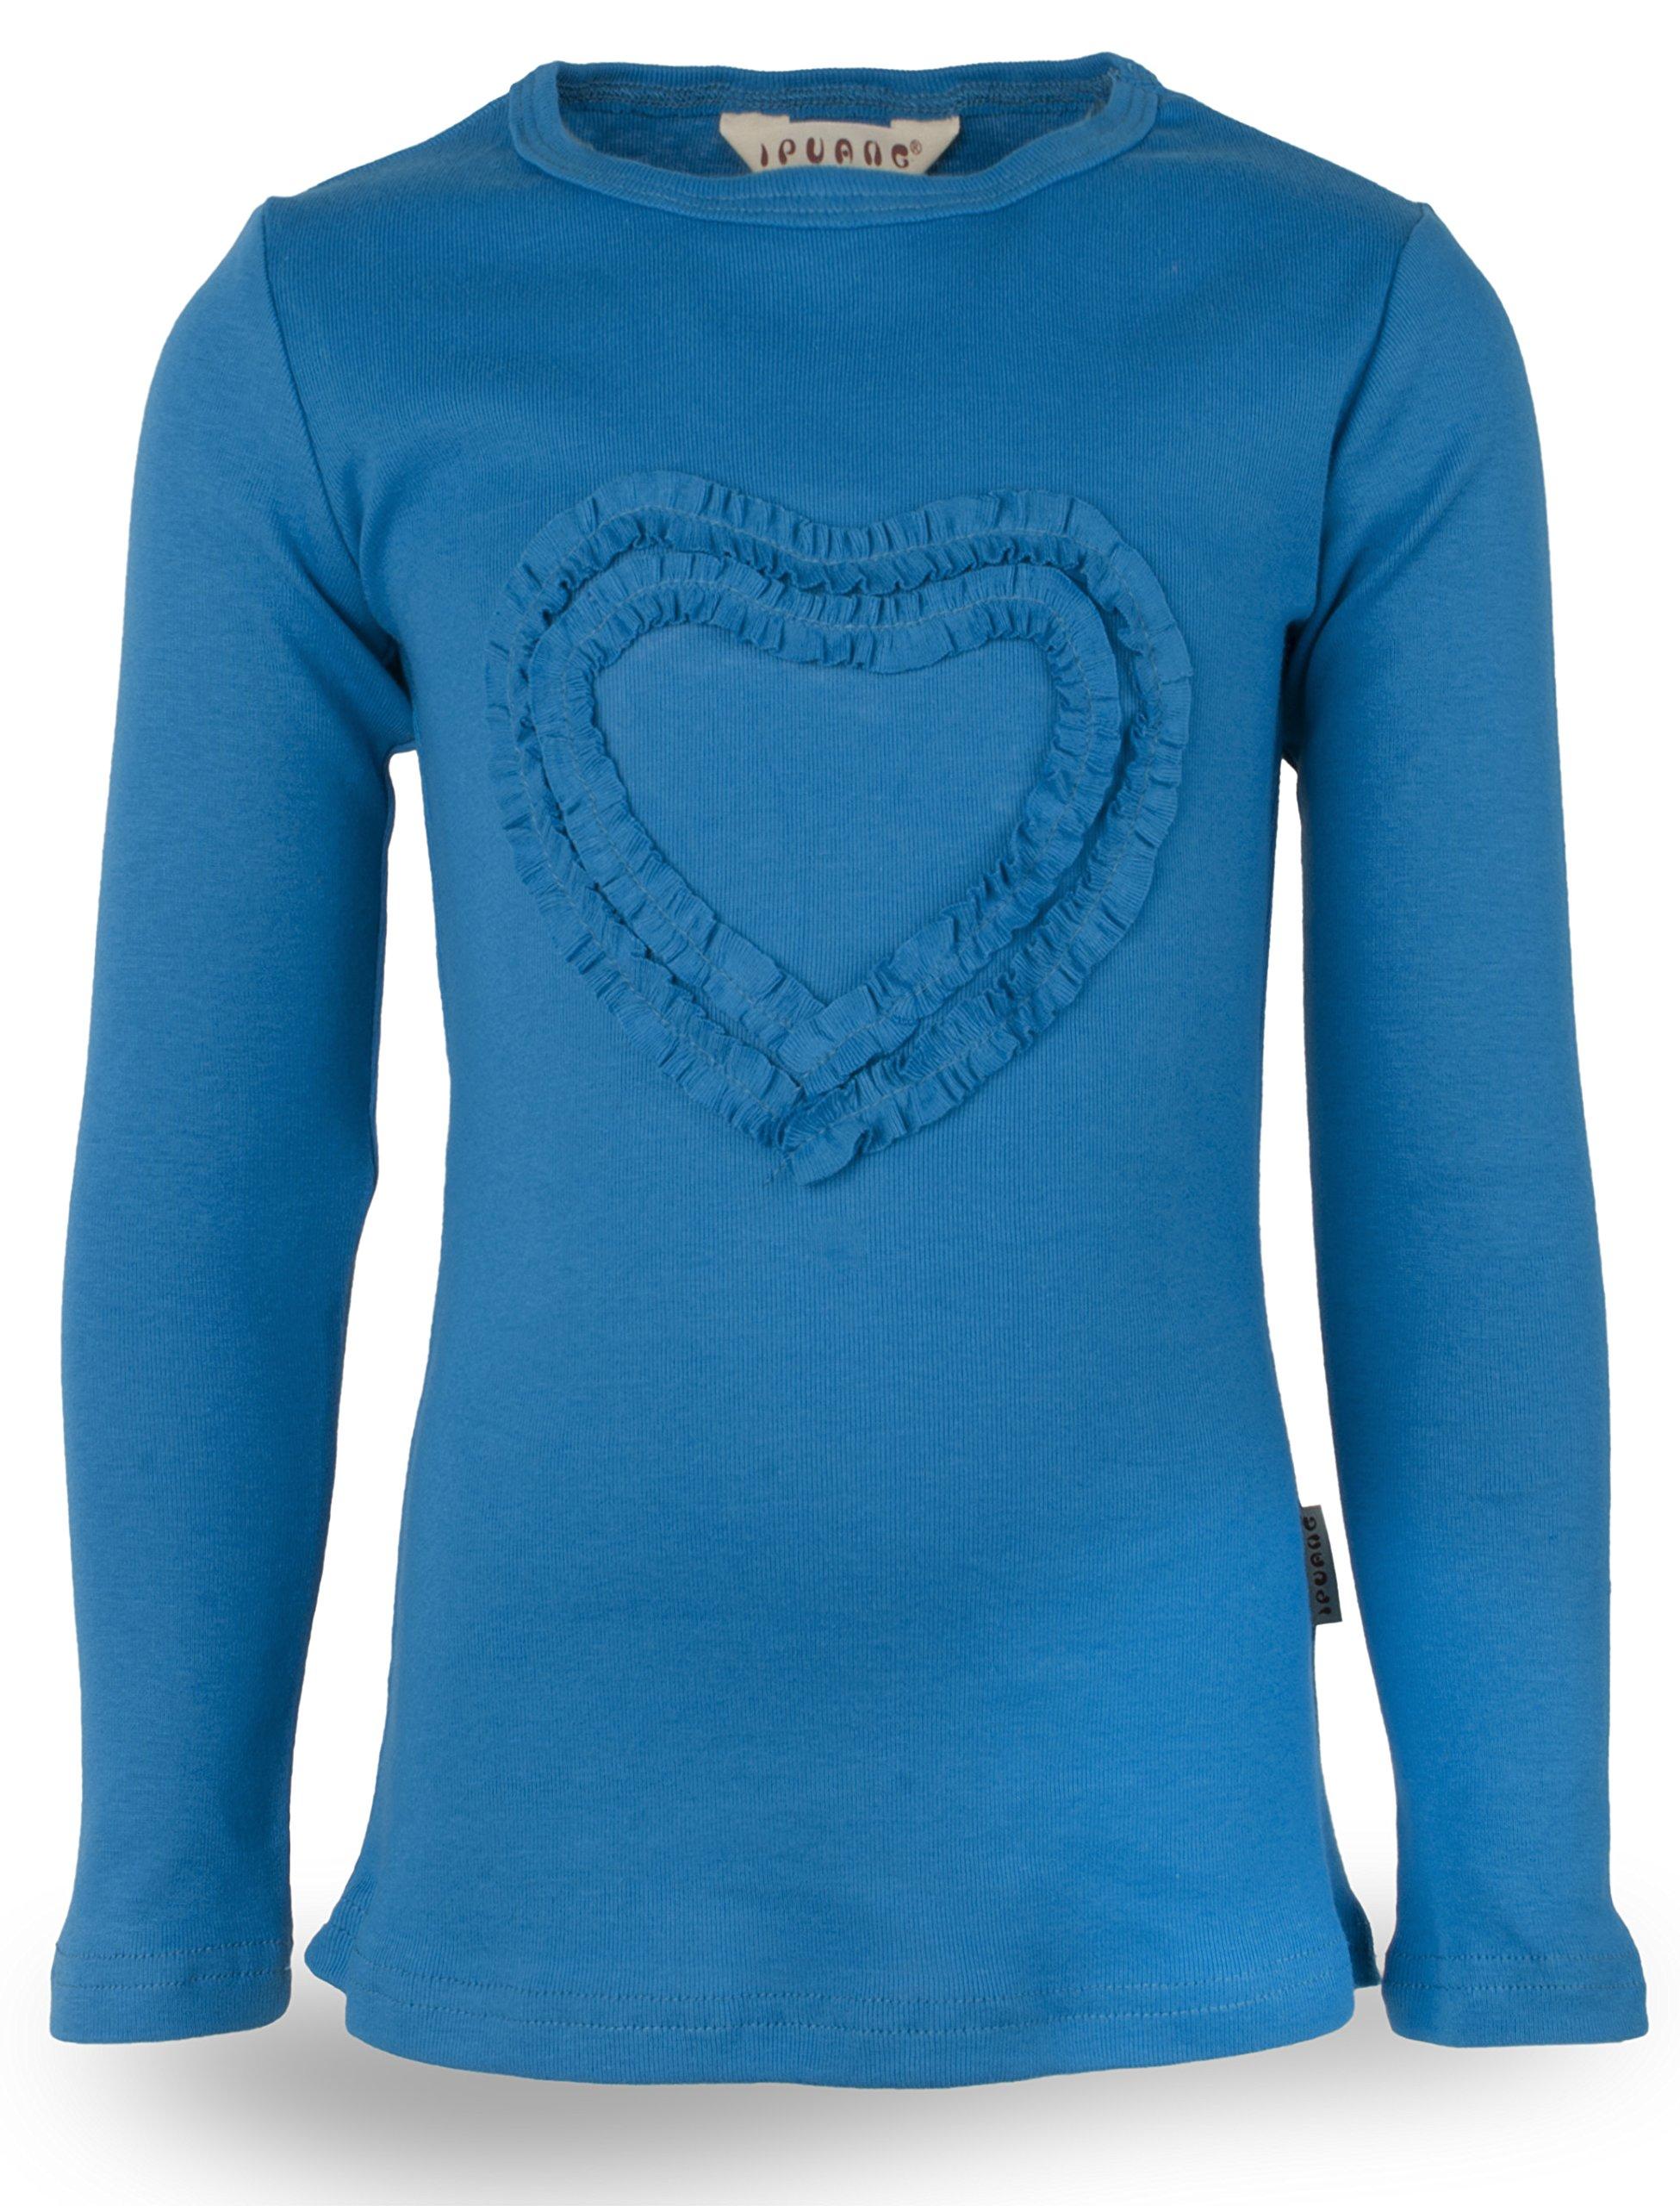 Ipuang Big Girls' Heart-Shaped Long Sleeve T-Shirt 8 Vivid Blue by Ipuang (Image #2)